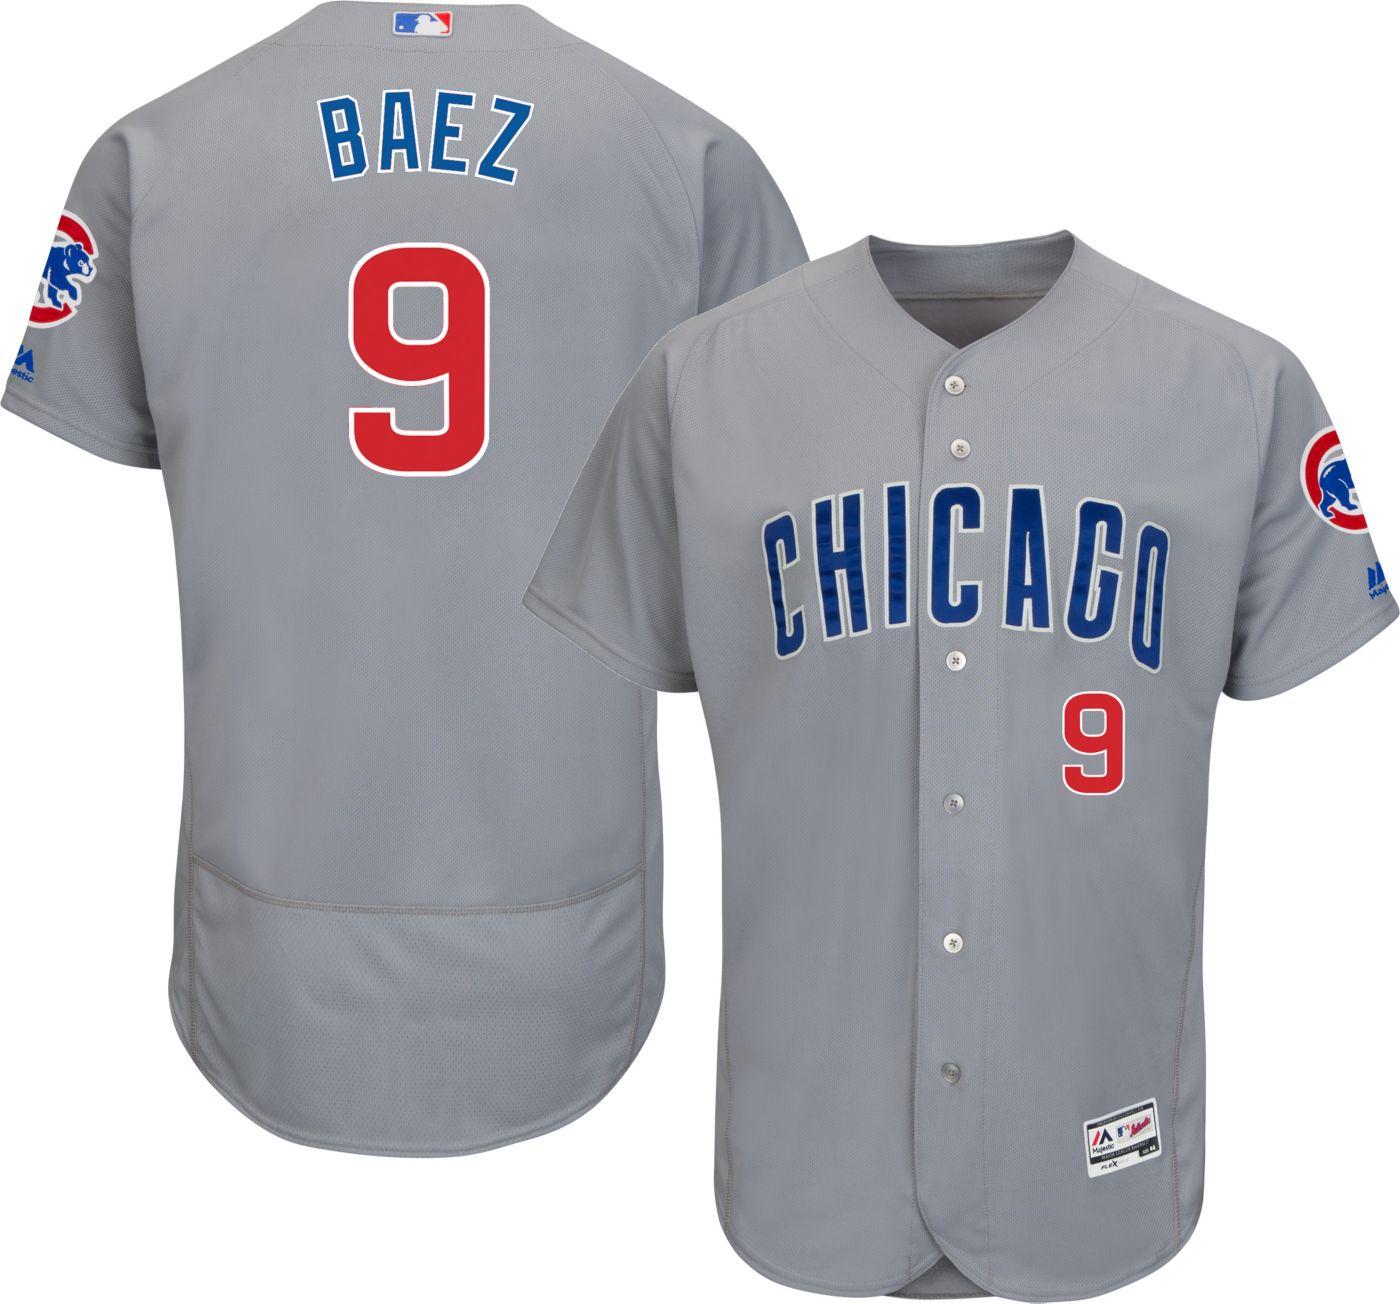 Majestic Men's Authentic Chicago Cubs Javier Baez #9 Road Grey Flex Base On-Field Jersey